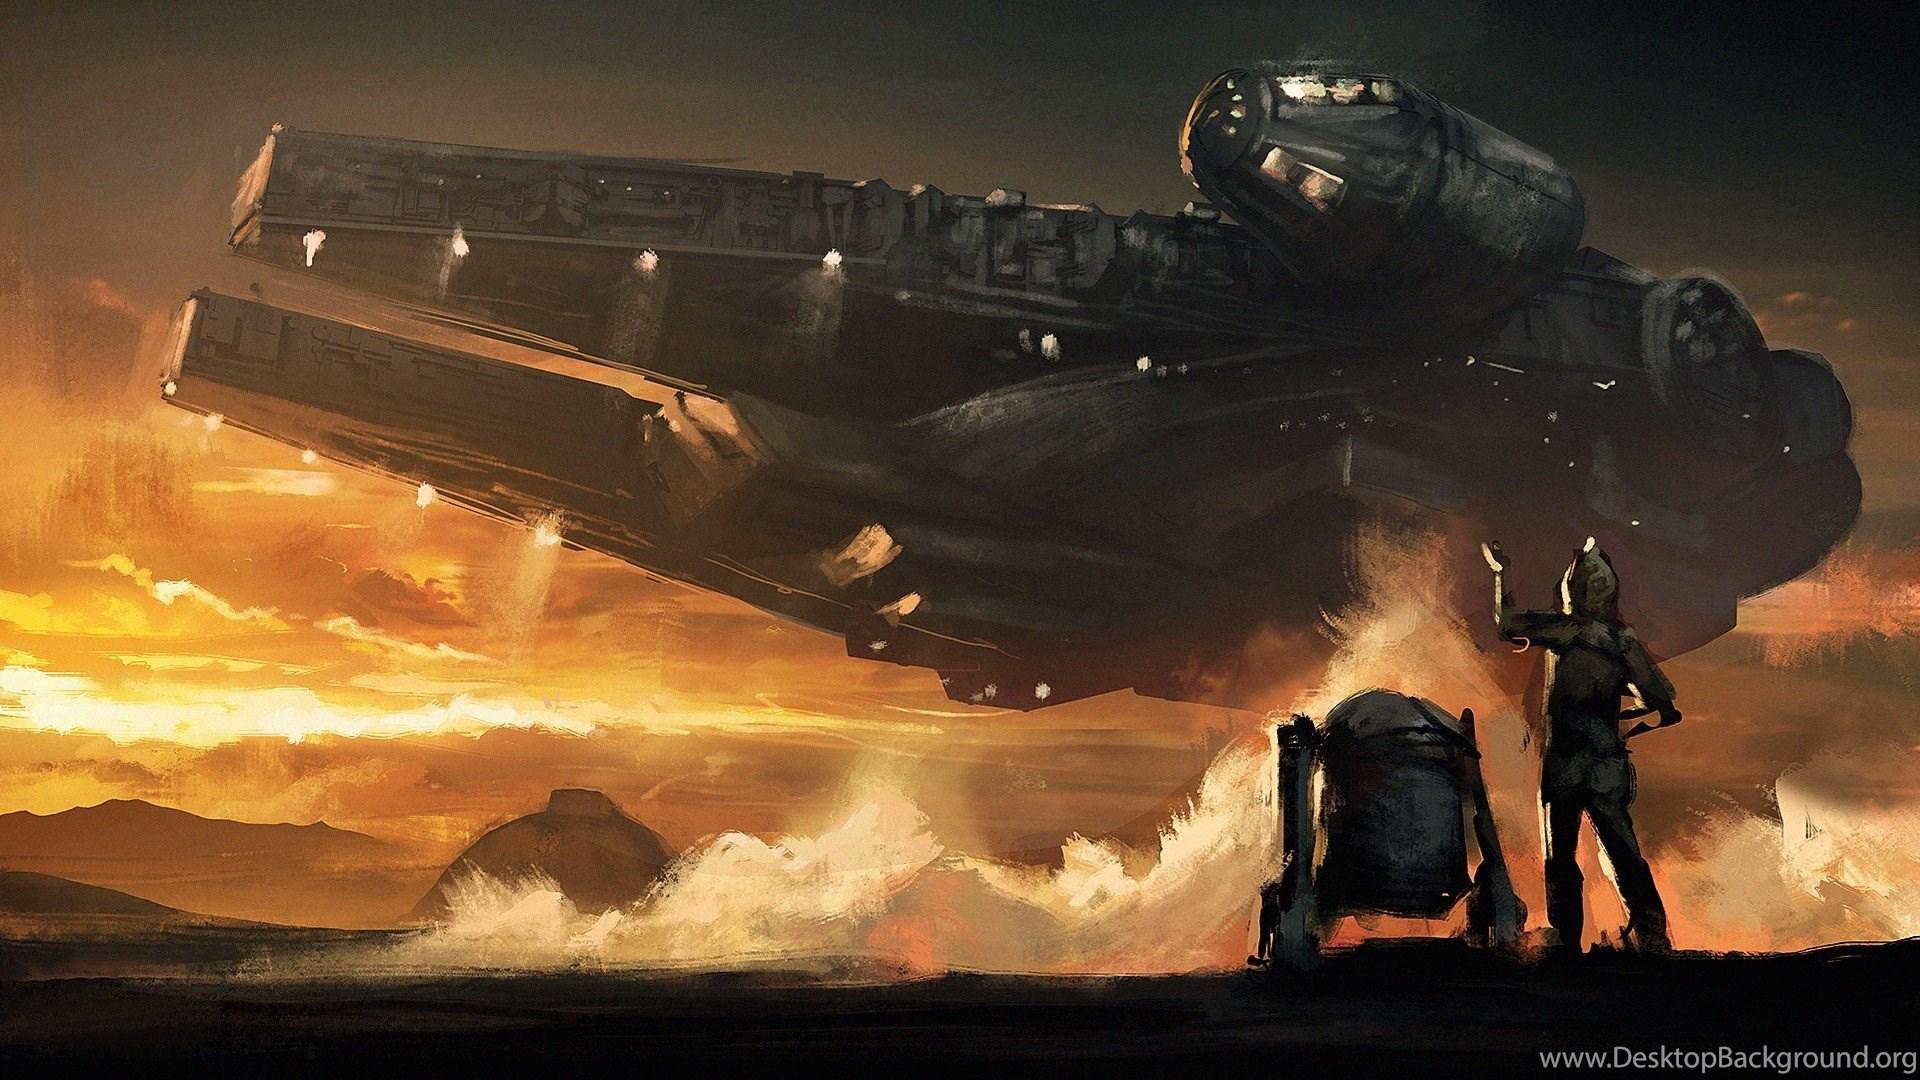 Star Wars Artwork Millennium Falcon Fantasy Art Wallpapers Hd Desktop Background